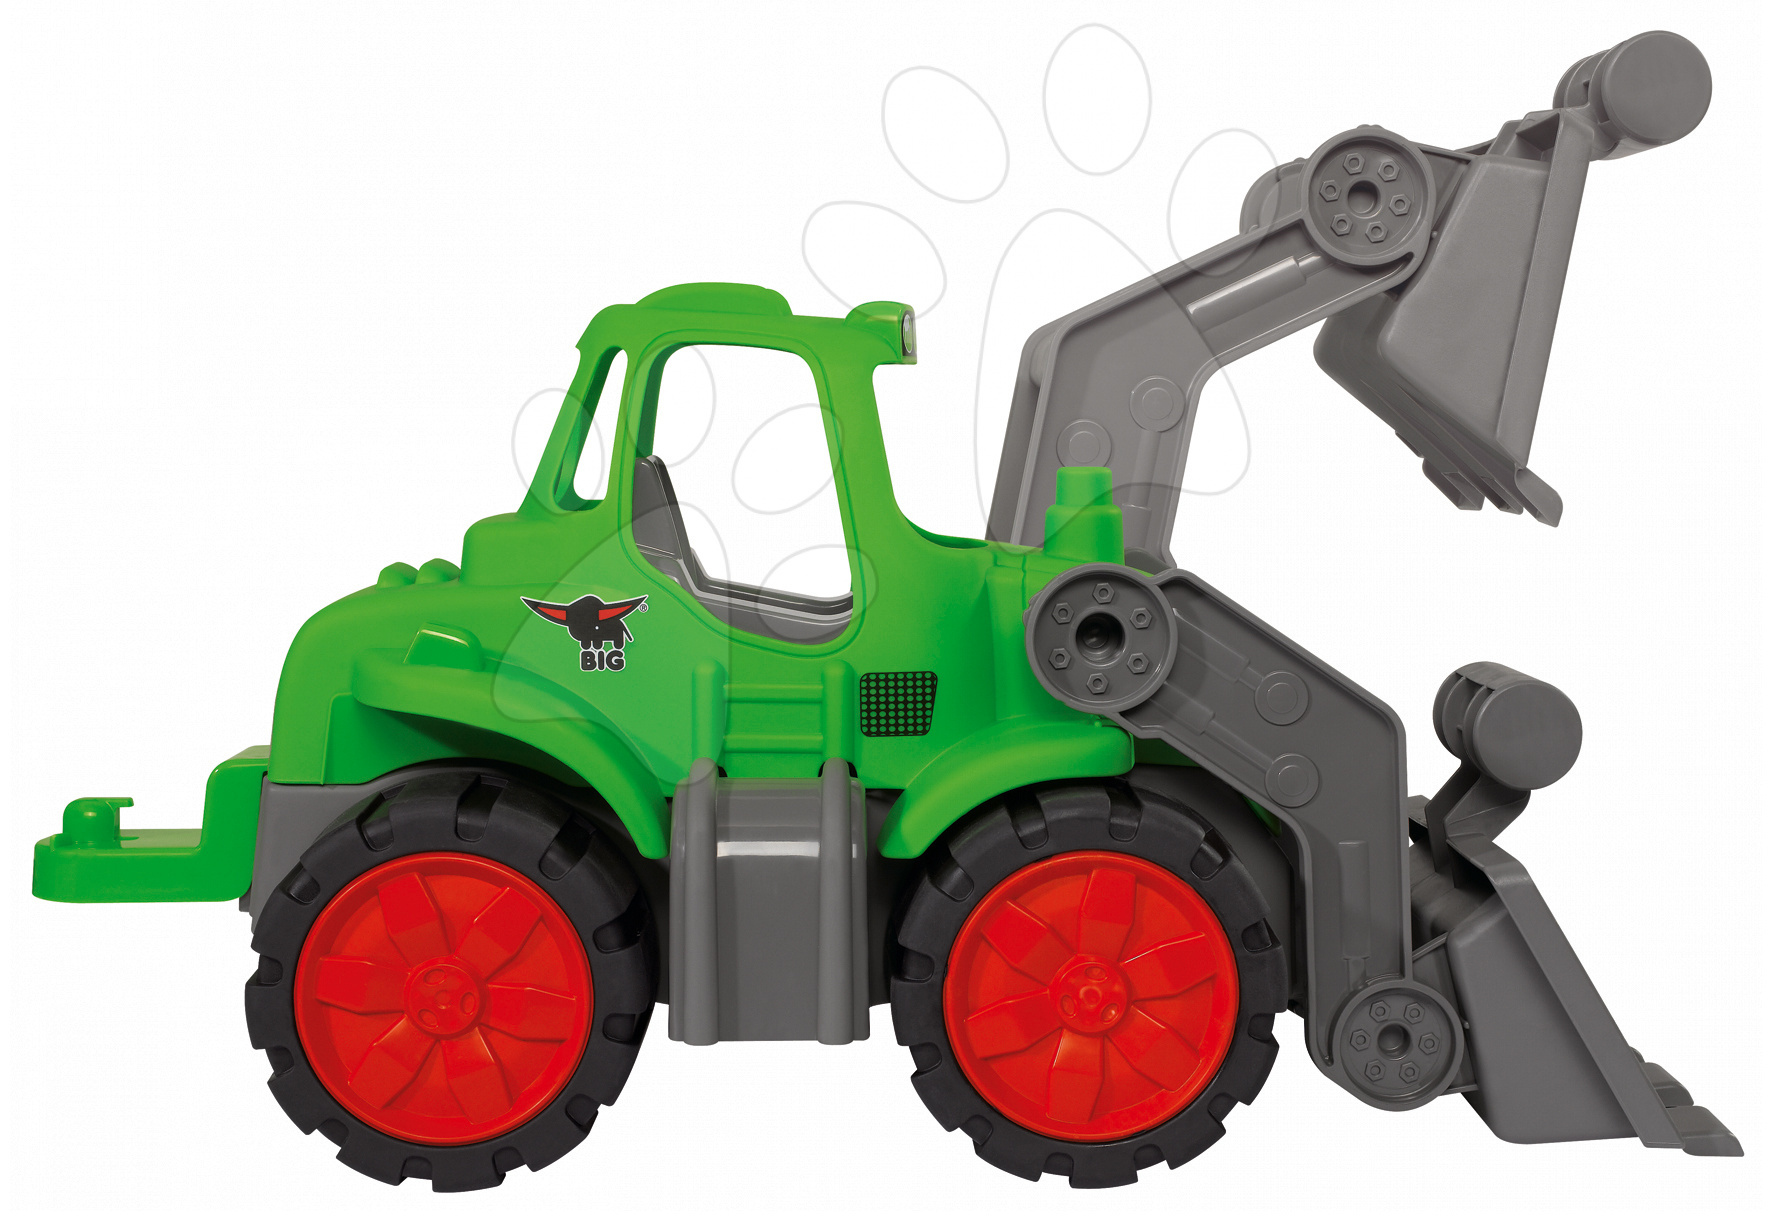 Auta do písku - Traktor Maxi Bolid Smoby délka 46 cm